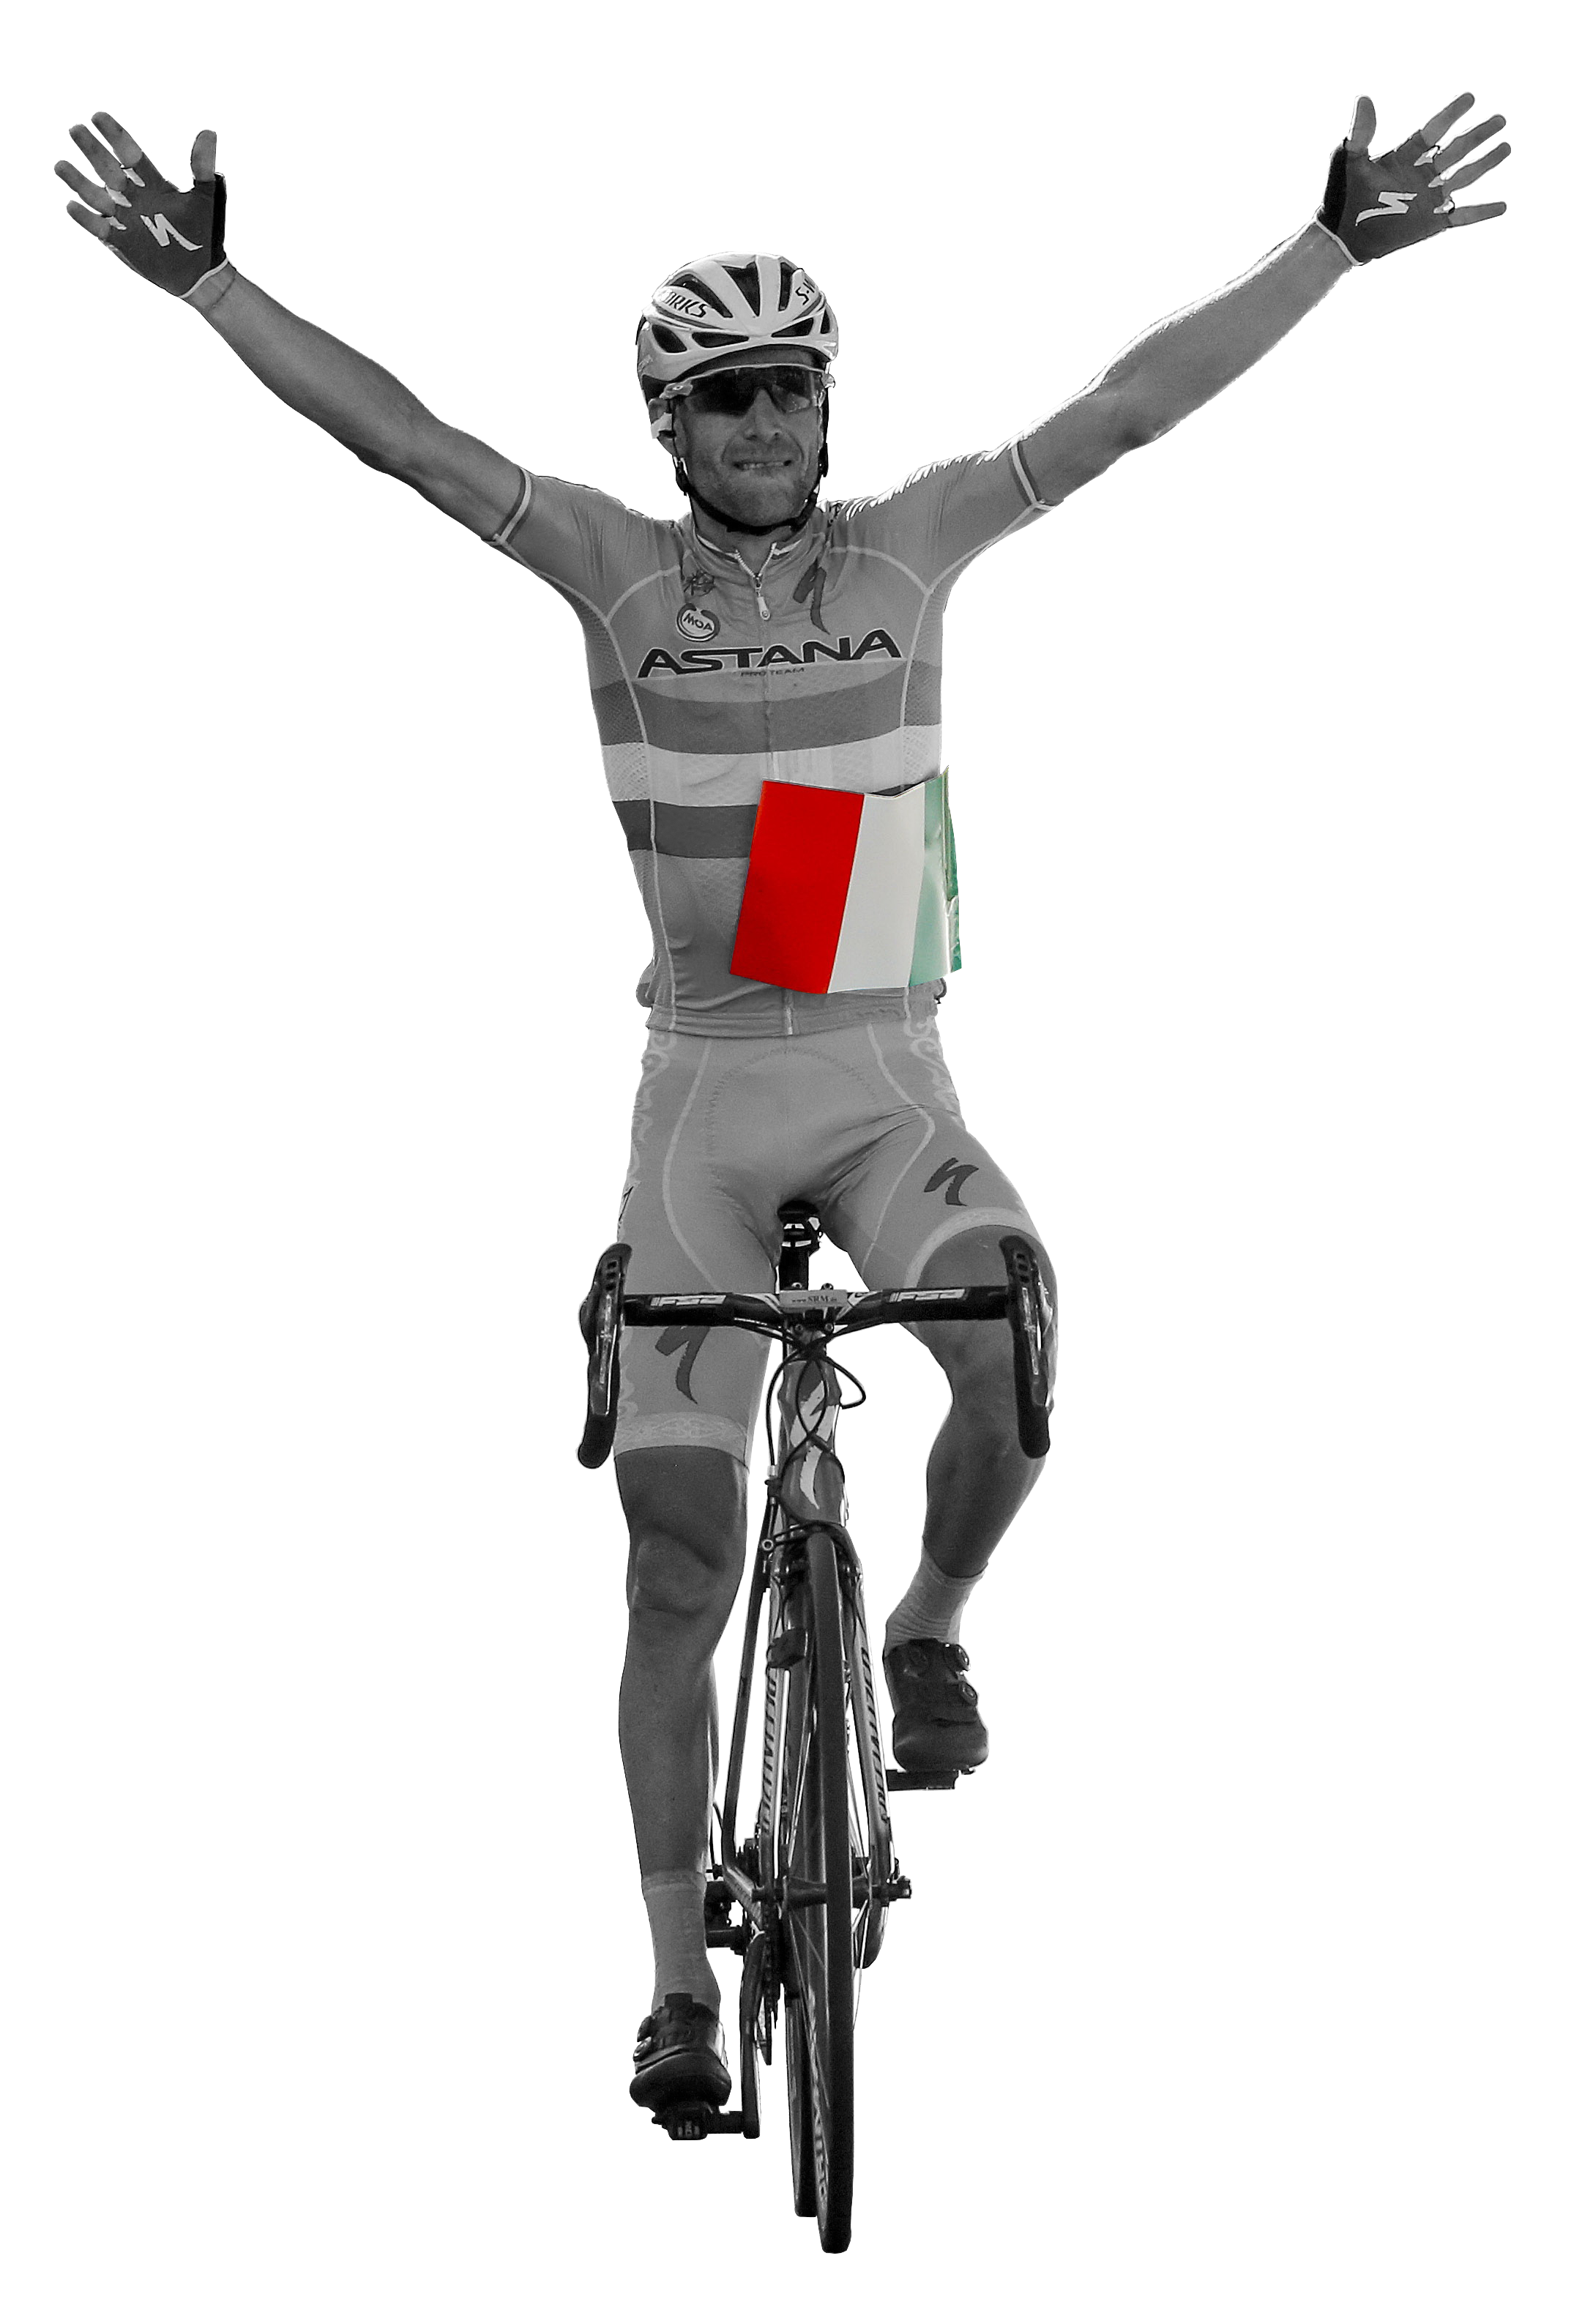 Campionati italiani ciclismo 2016 Nibali copertina